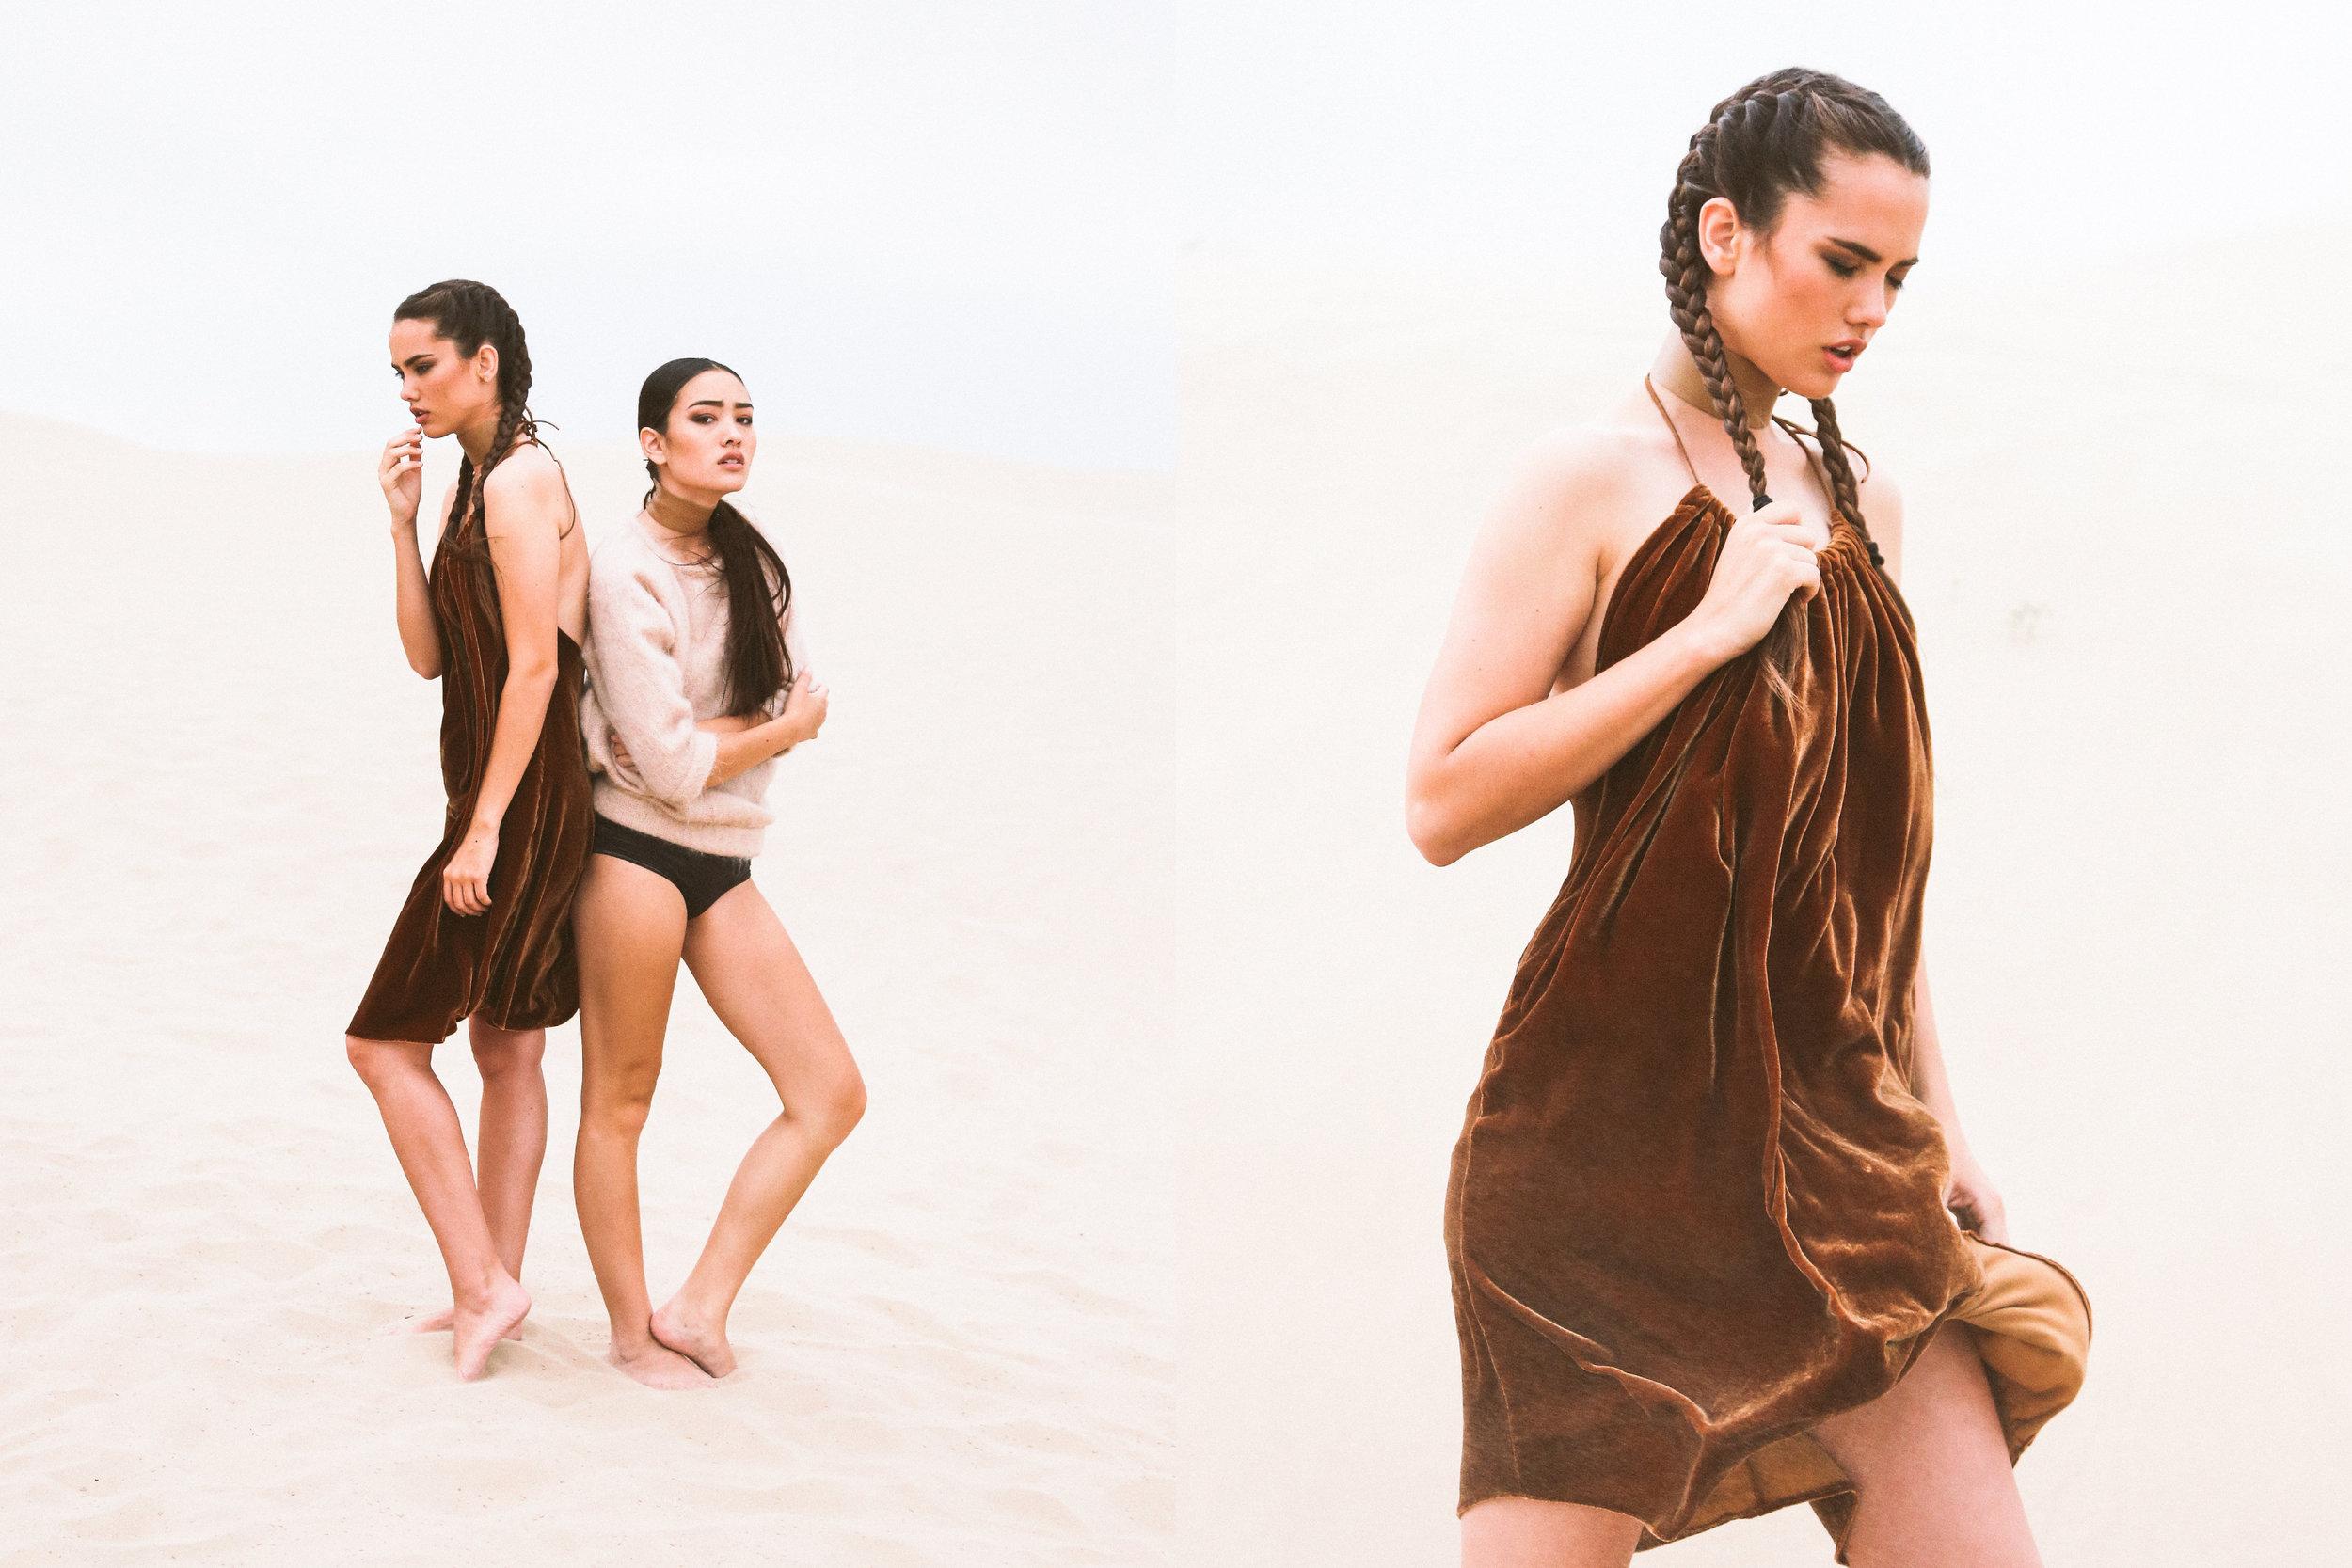 DETAILS  Photography: Evelyn Eslava  Makeup: Chelsea Vuksinick  Wardrobe: Melody Noy  Models (left to right): Tiffany Pliler , Elizabeth Wood  Styling by: Megan Beckham